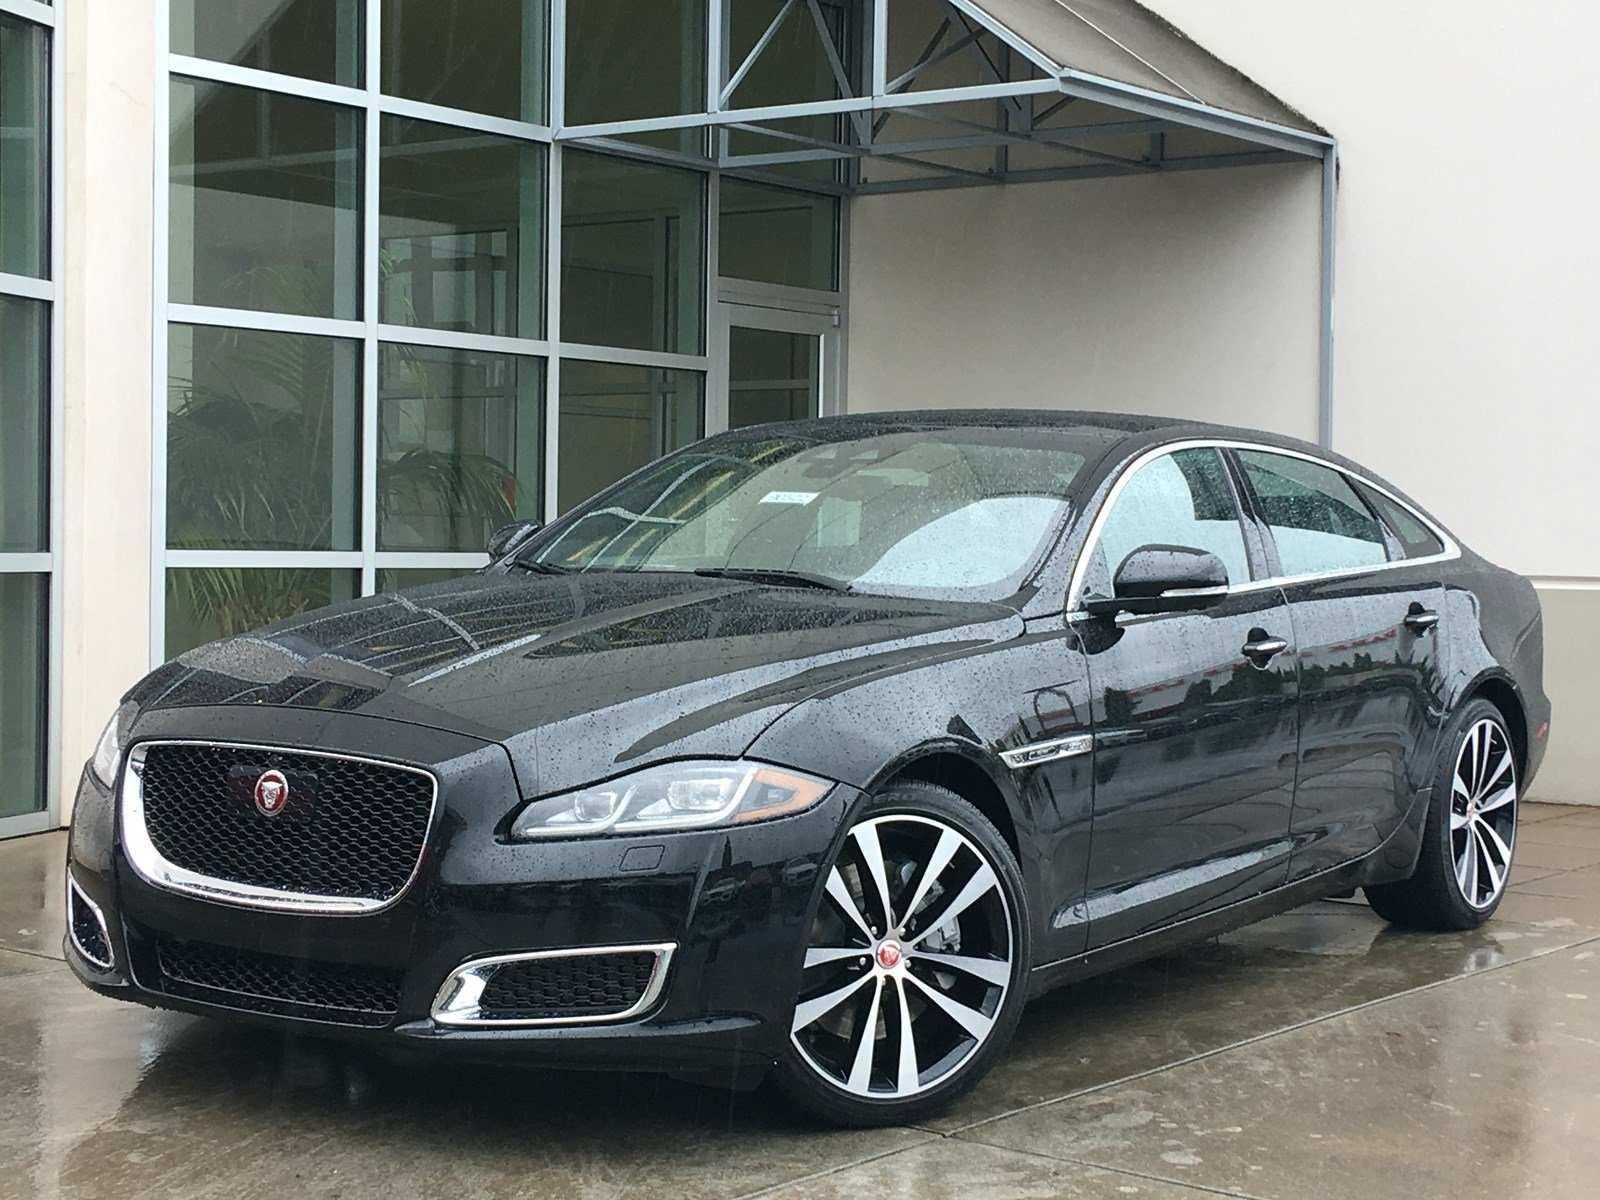 19 Gallery of New 2019 Jaguar Xj Images by New 2019 Jaguar Xj